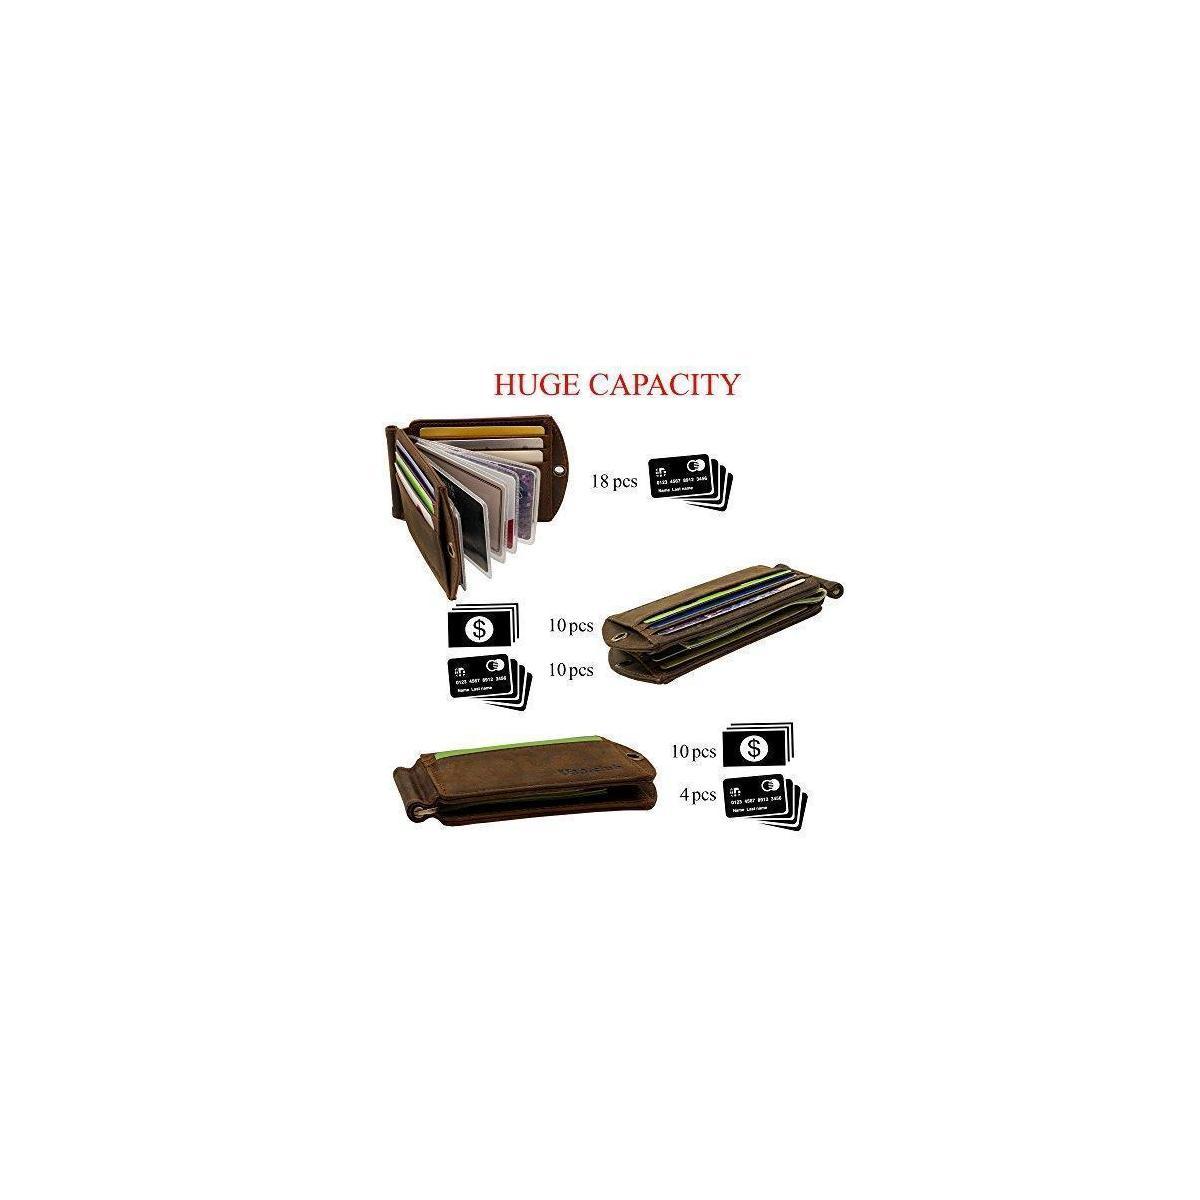 RFID Smart Blocking Slim Genuine Leather Thin Minimalist Front Pocket EDC Wallets for Men with Money Clip